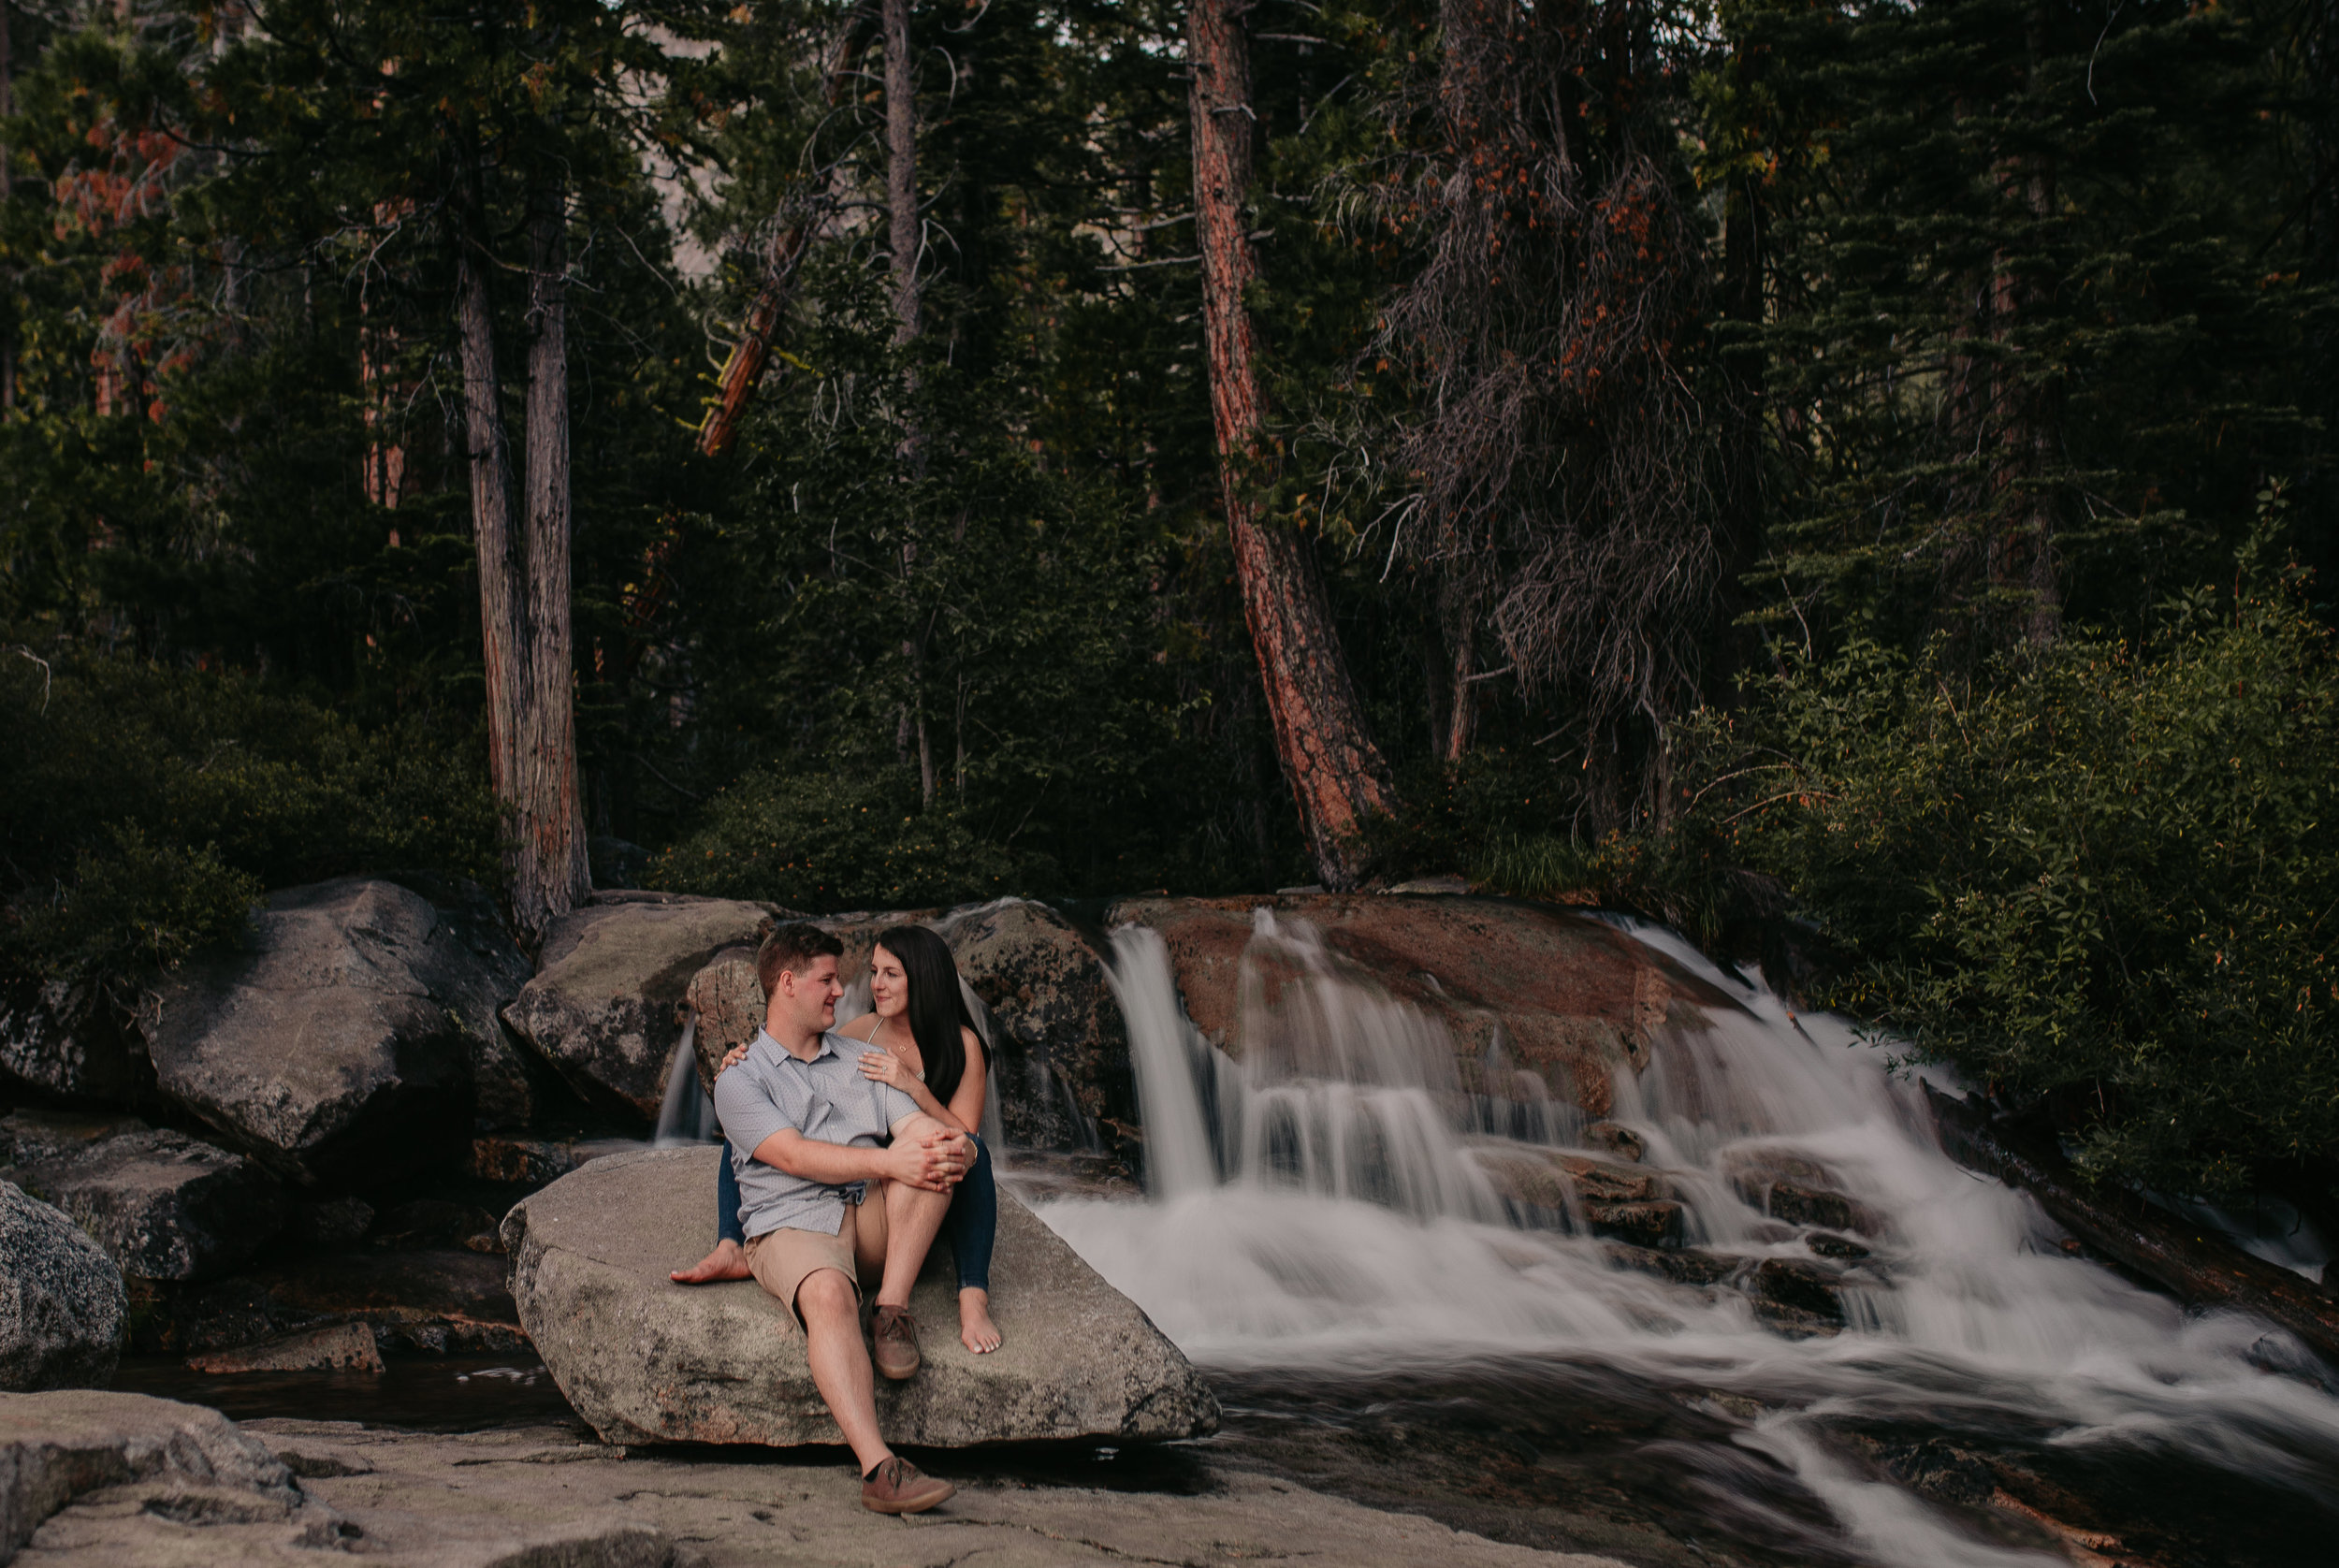 nicole-daacke-photography-fun-adventure-session-waterfall-lake-tahoe-sunset-destination-wedding-photographer-northern-california-elopement-photographer-33.jpg